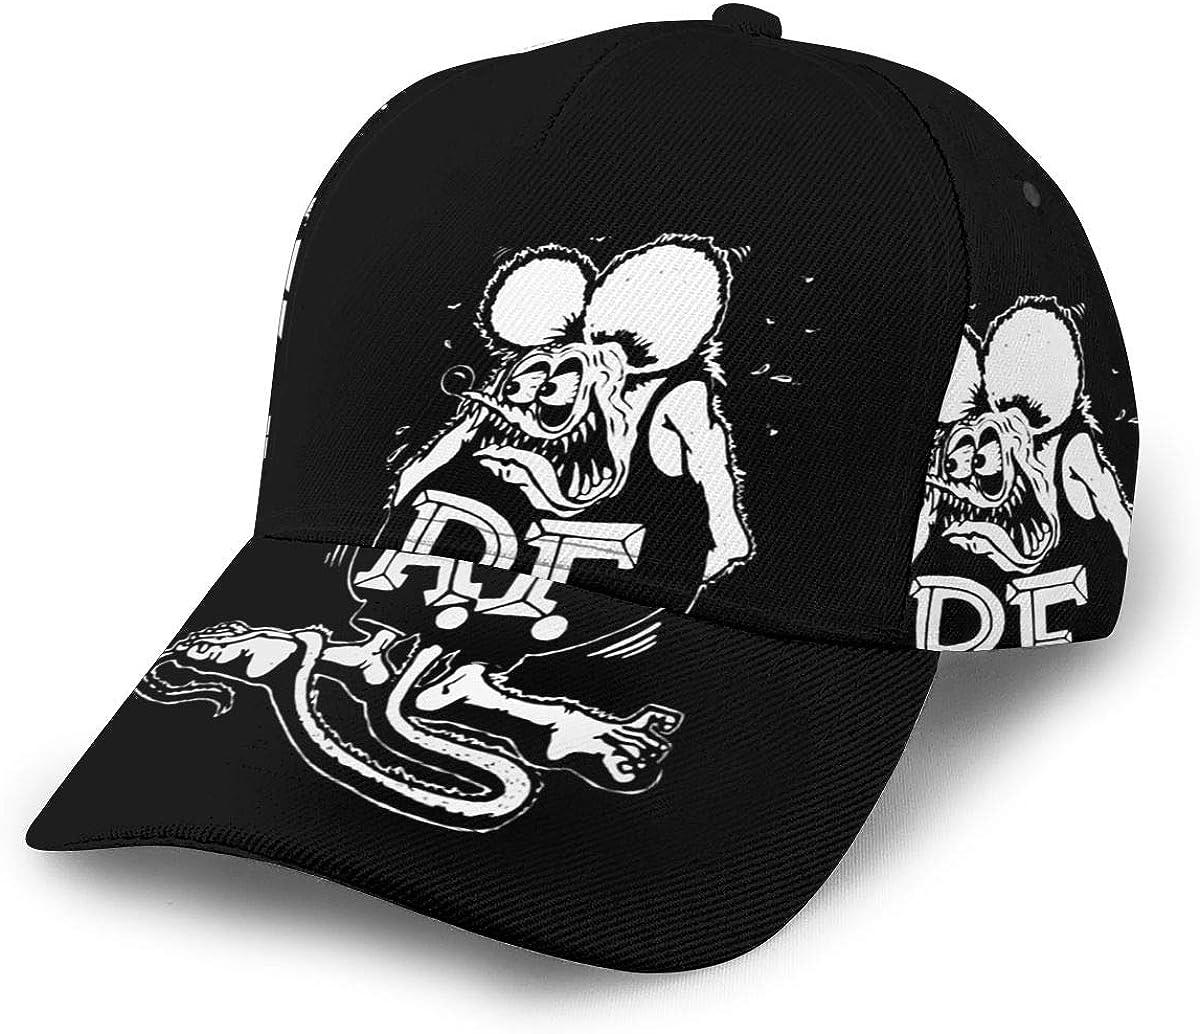 LuchinoVisconti Rat Fink 3D Printed Adjustable Baseball Cap,Hip Hop Snapback Hat for Men Women Teens Black